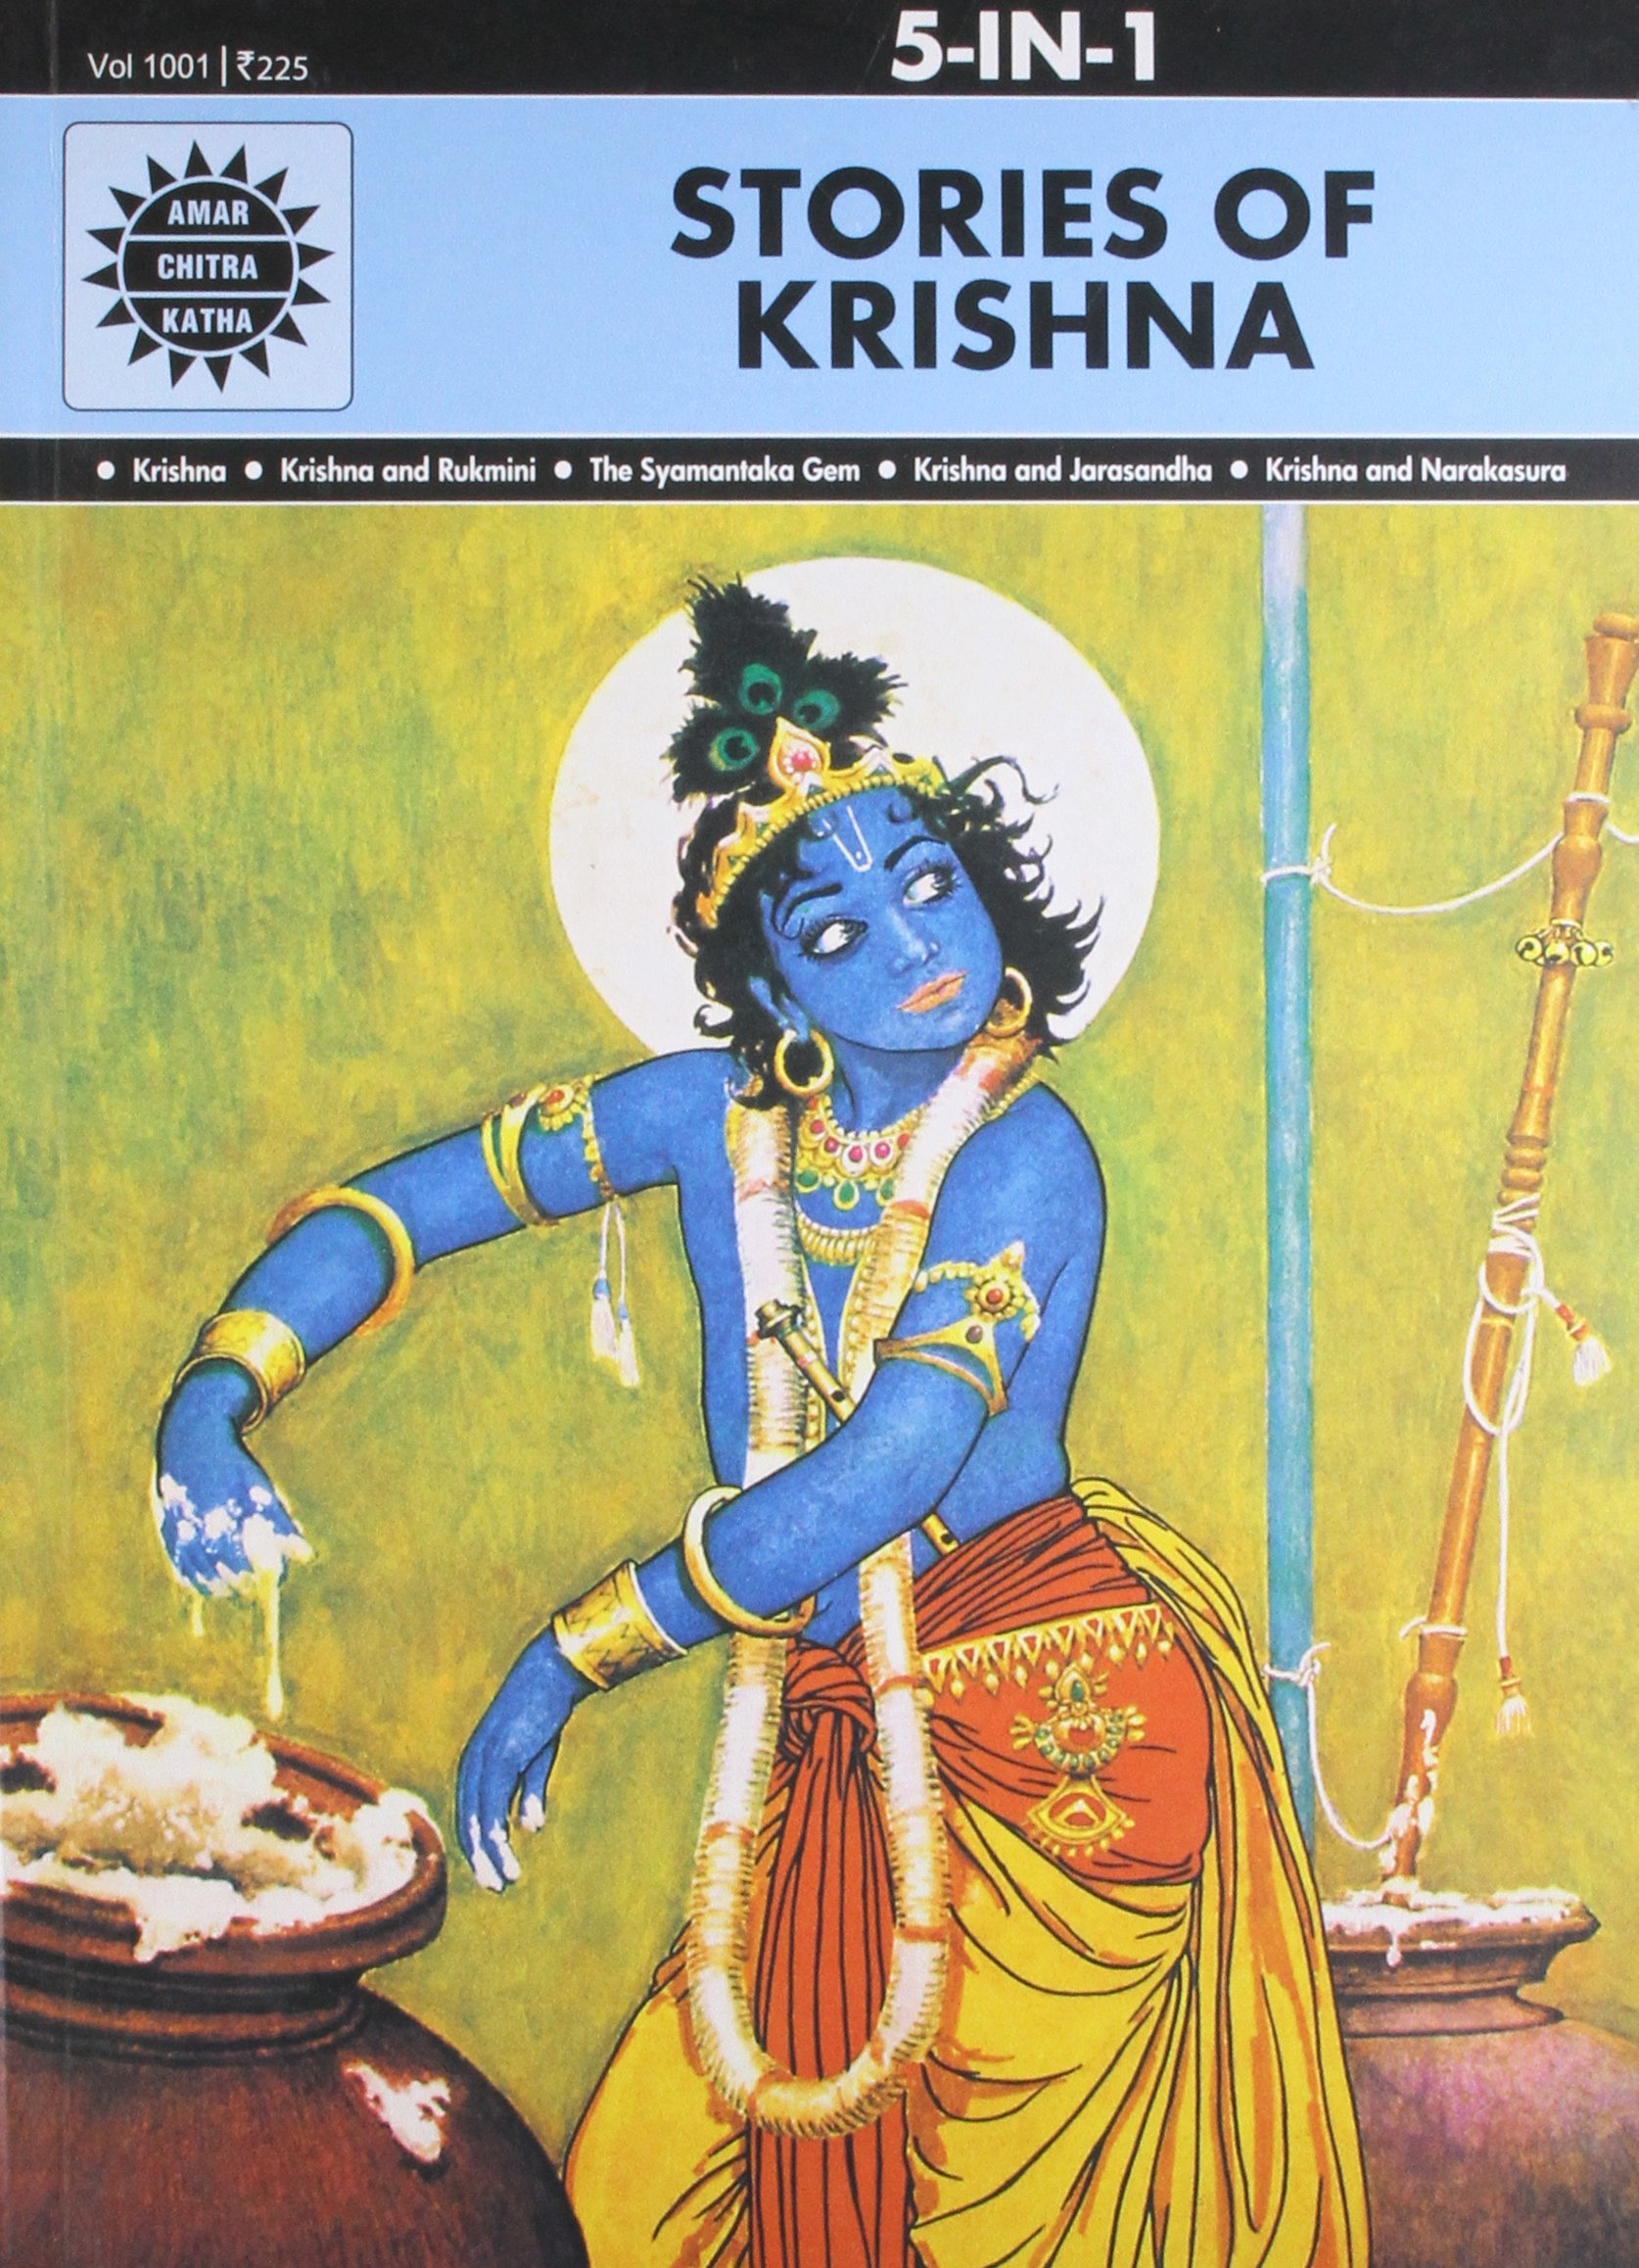 Amar Chitra Katha - Draupadi